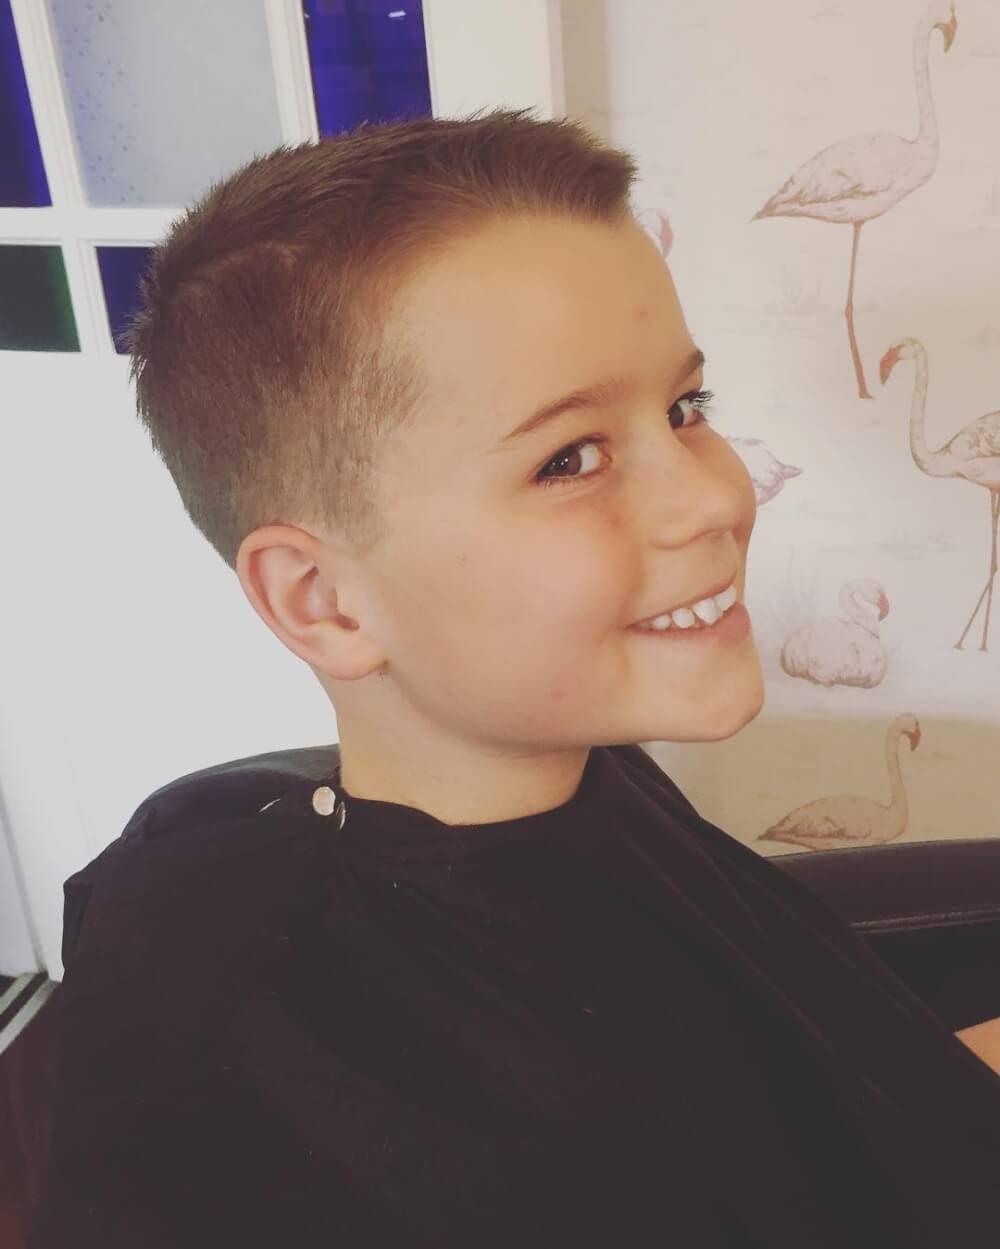 28 coolest boys haircuts for school in 2019 | little boy